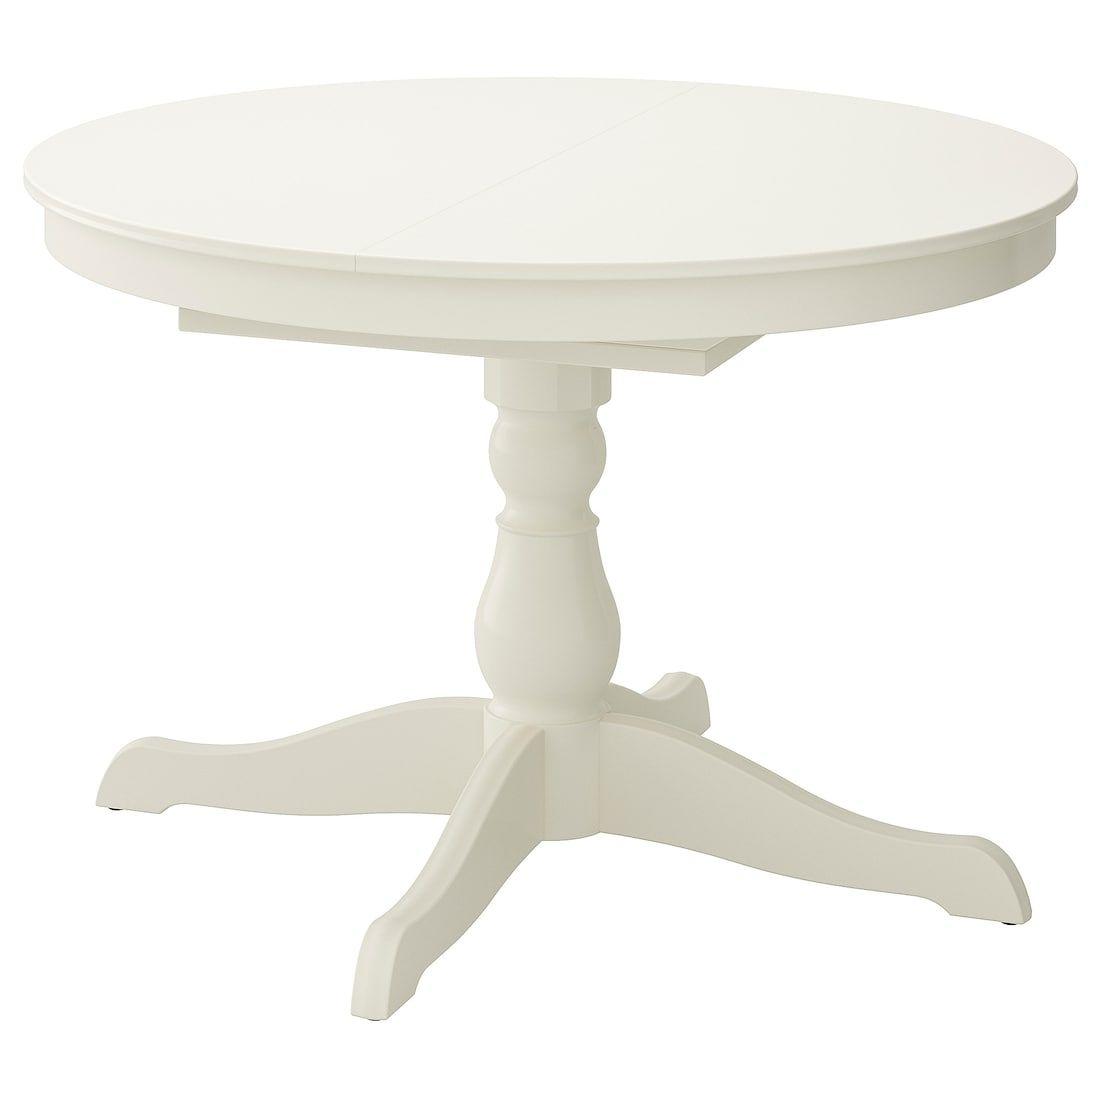 "INGATORP Extendable table, white, Max. length: 61"" - IKEA"